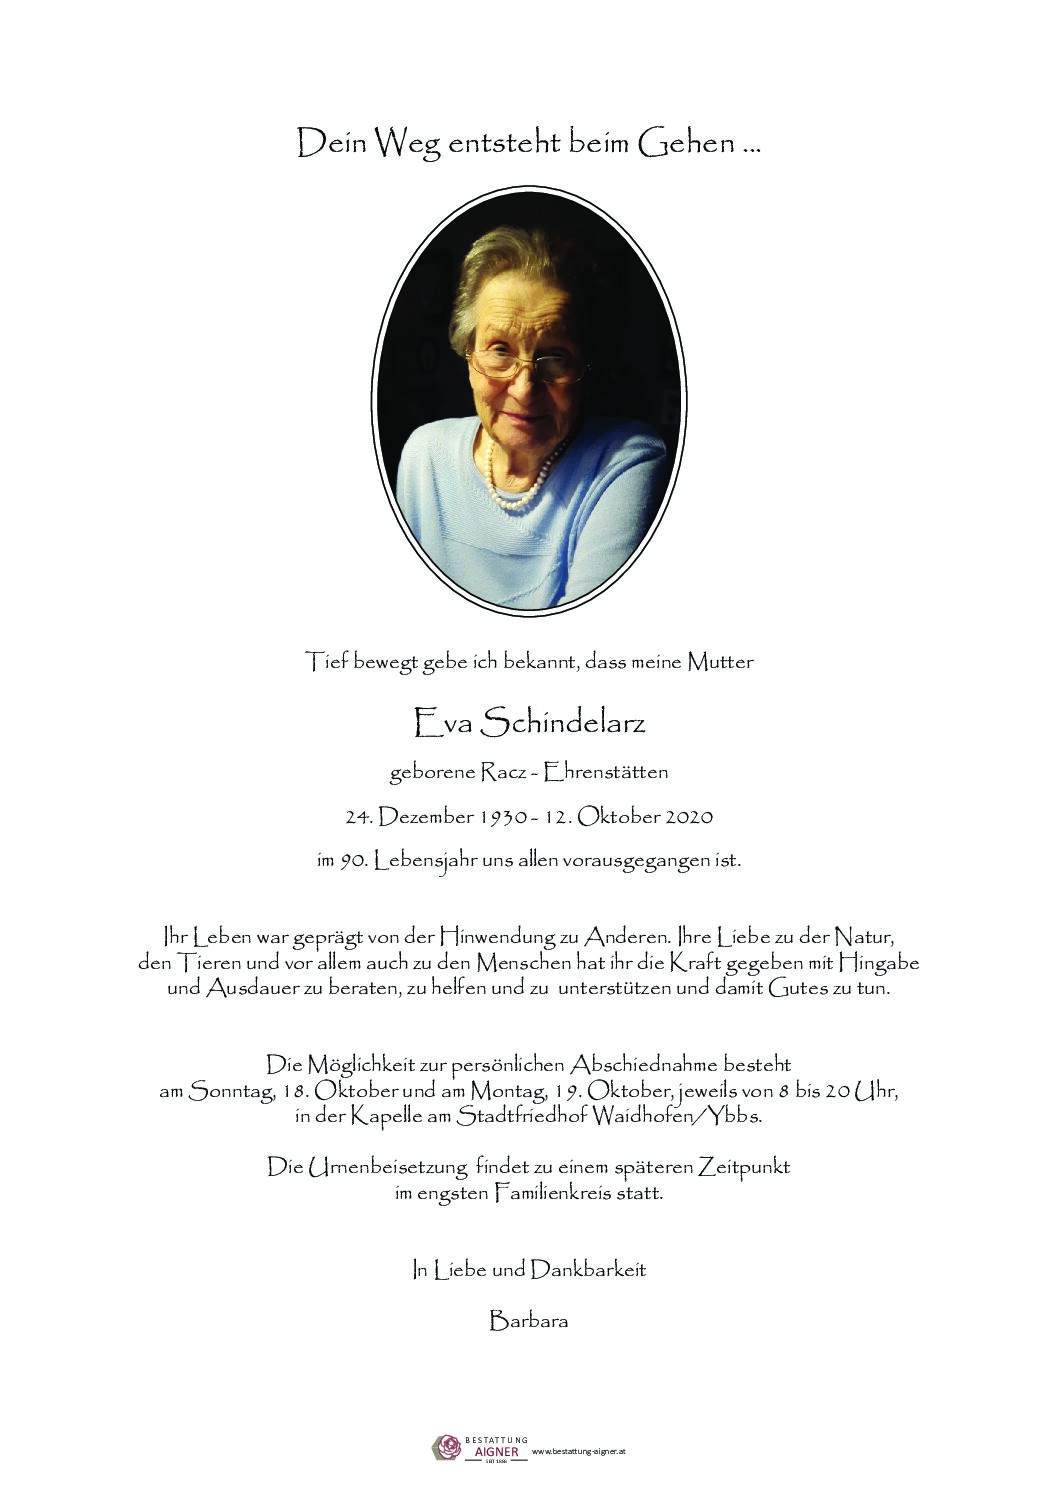 Eva Schindelarz